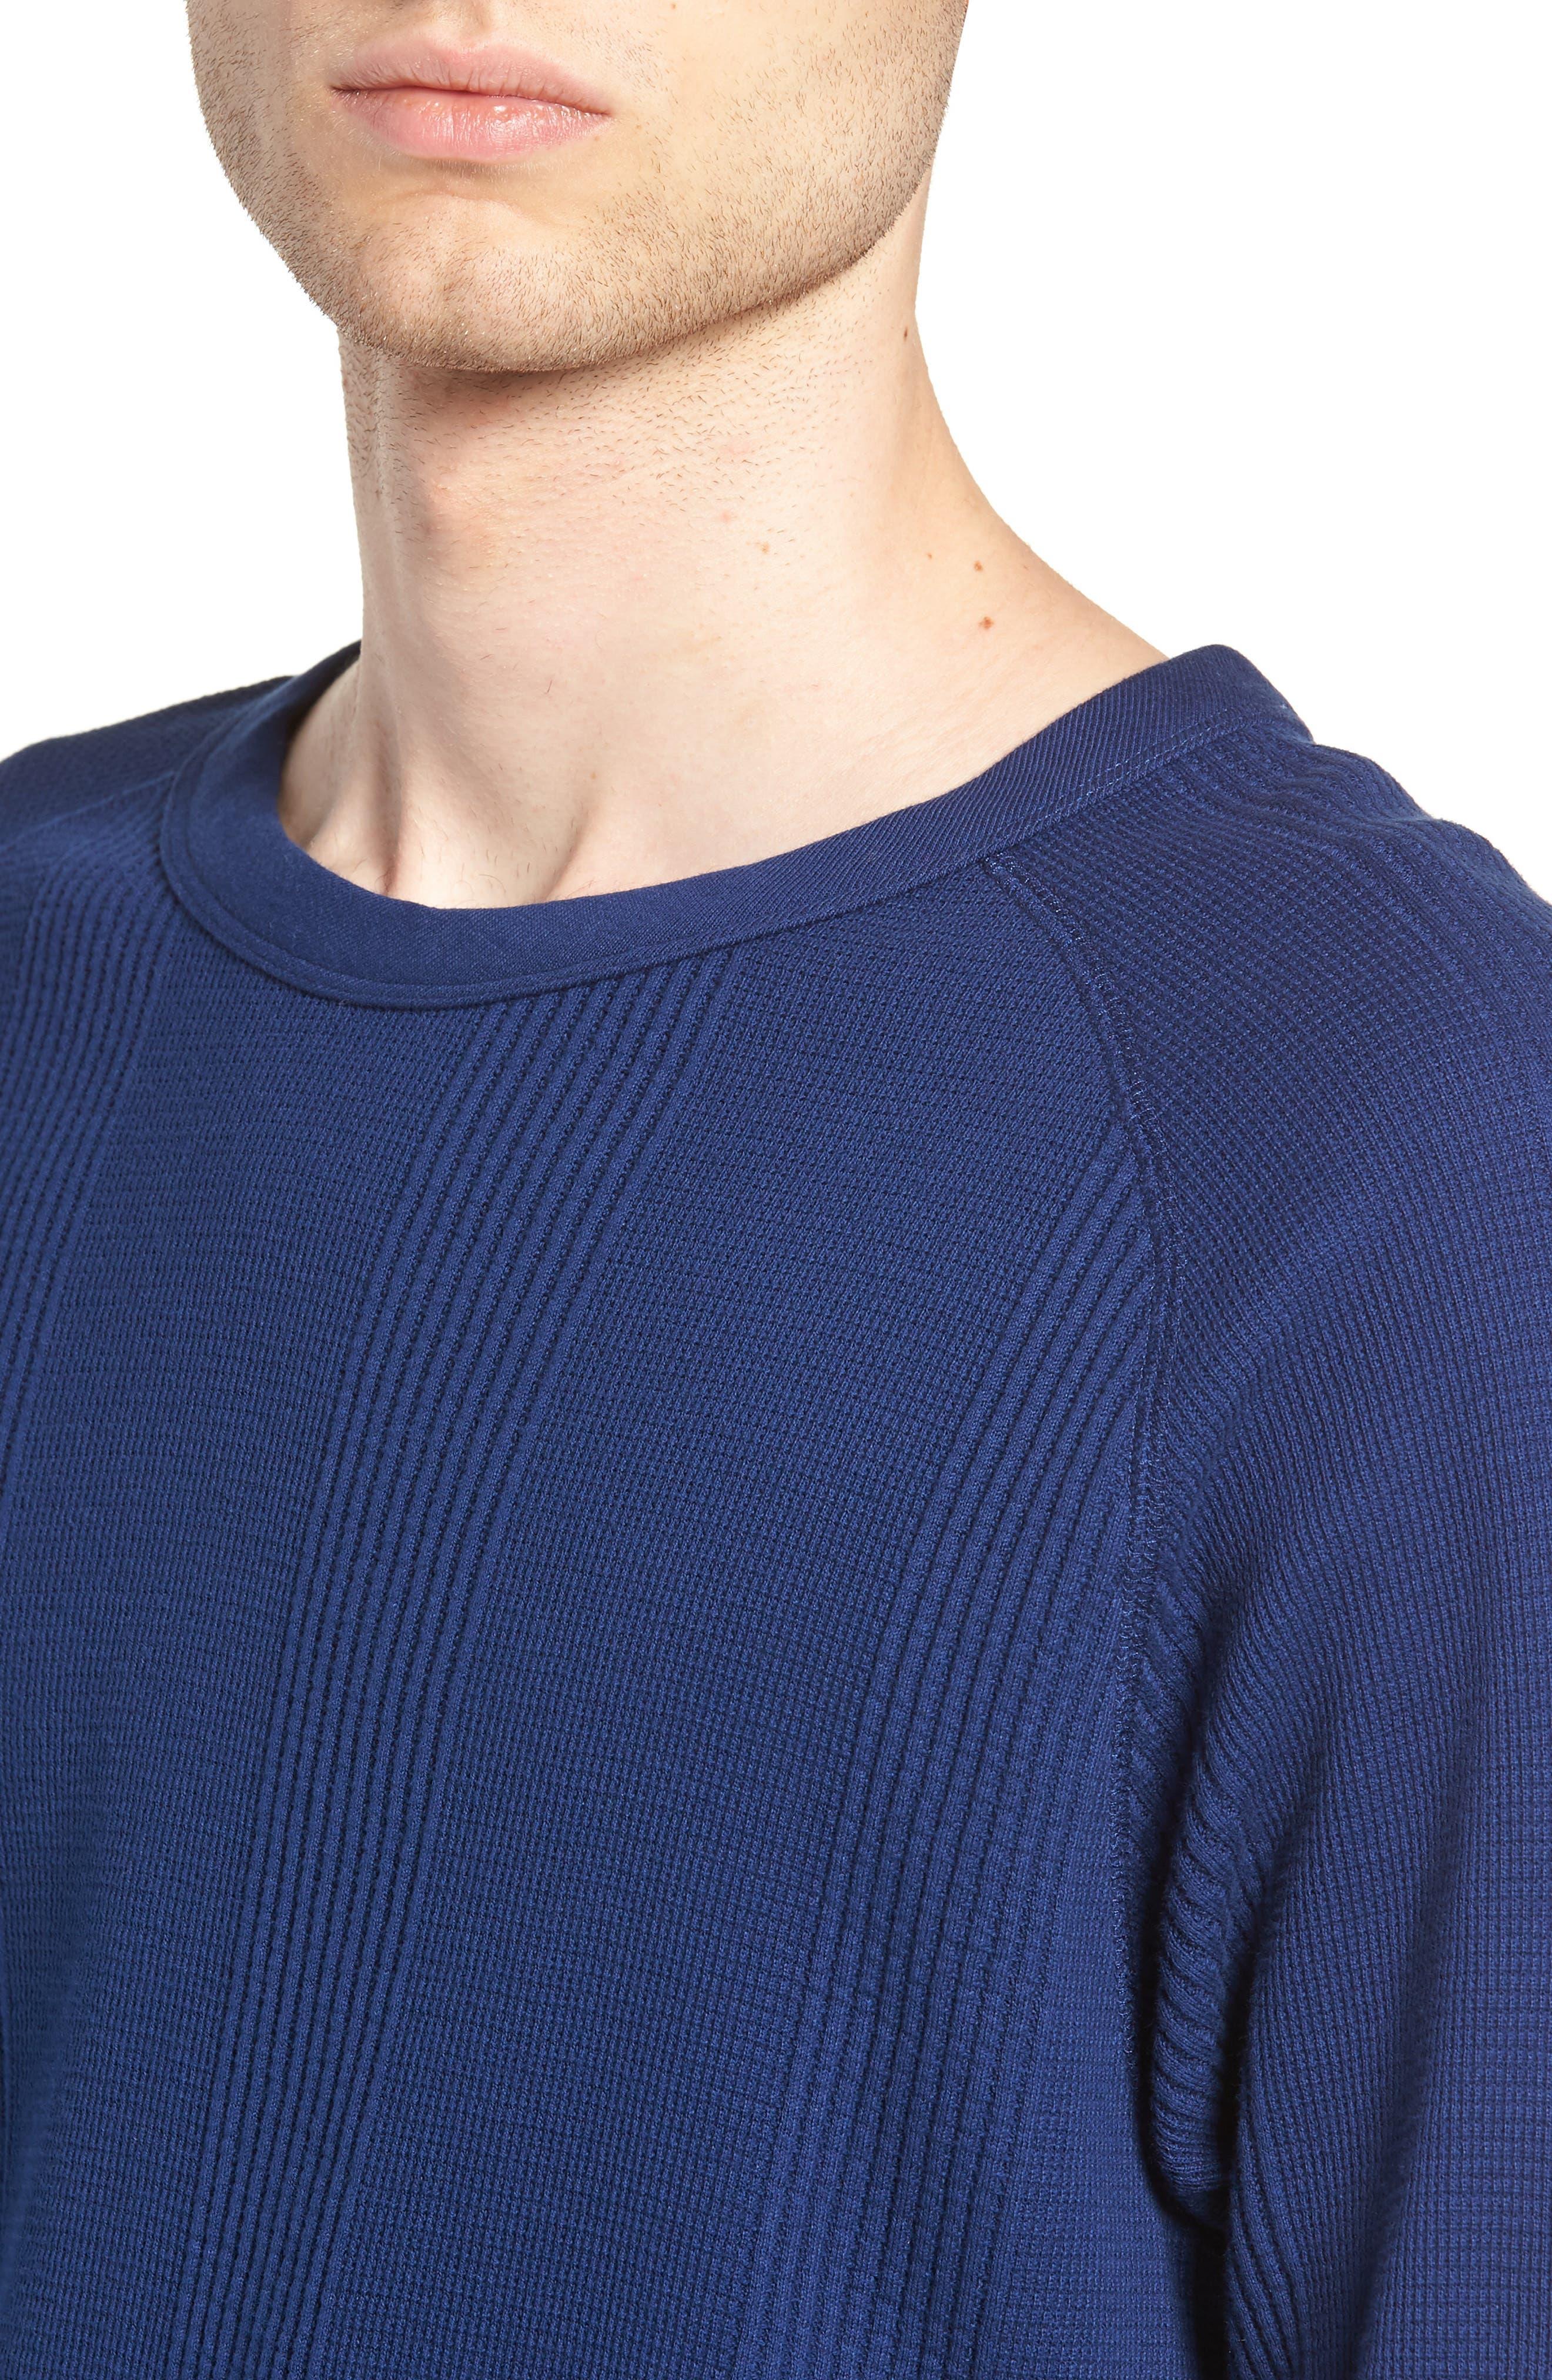 Kasu Waffle Stripe Sweater,                             Alternate thumbnail 4, color,                             COBALT